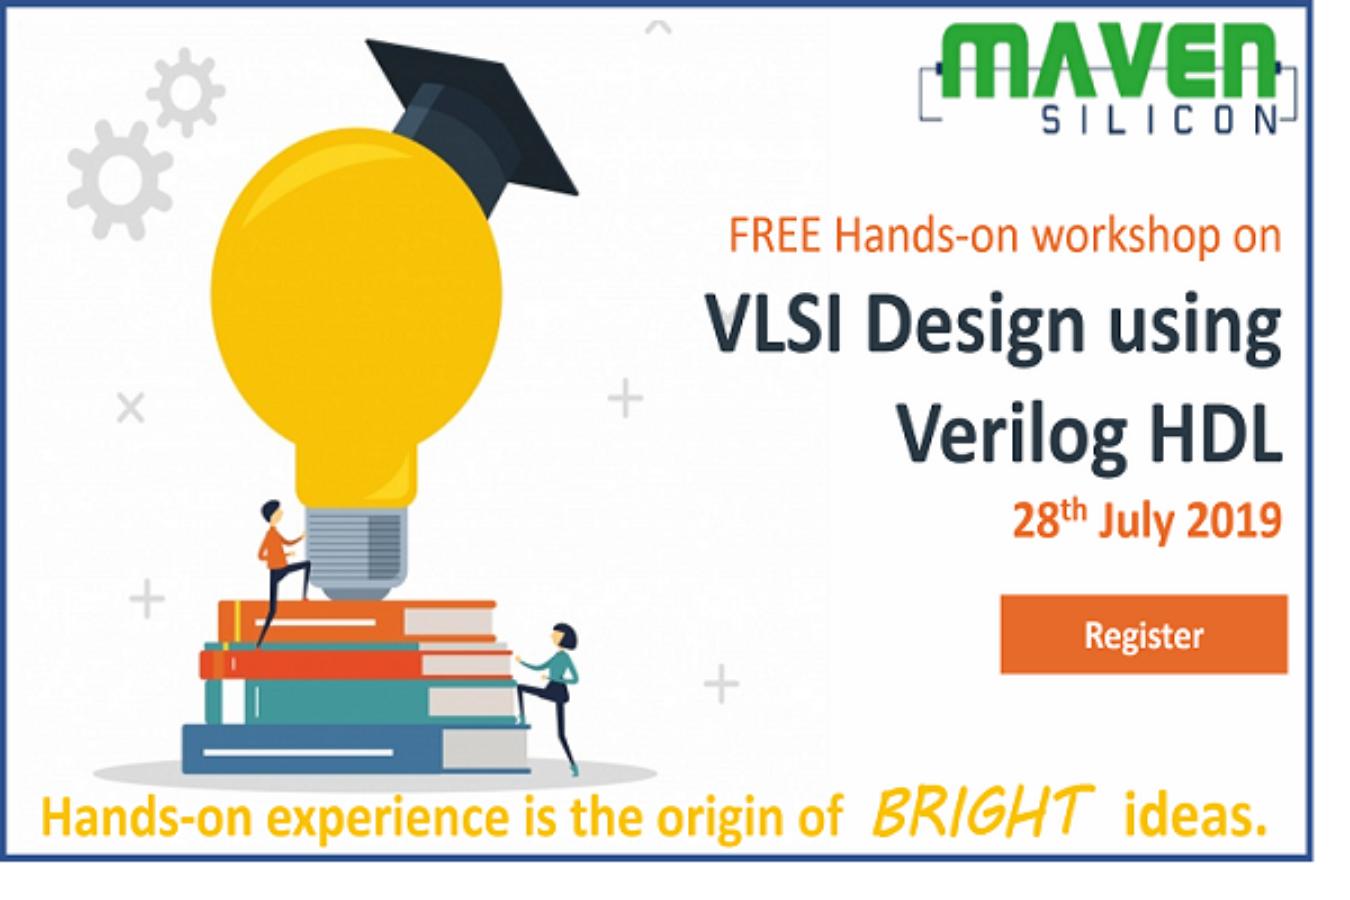 Join us for a FREE Hands-on Workshop on VLSI Design using